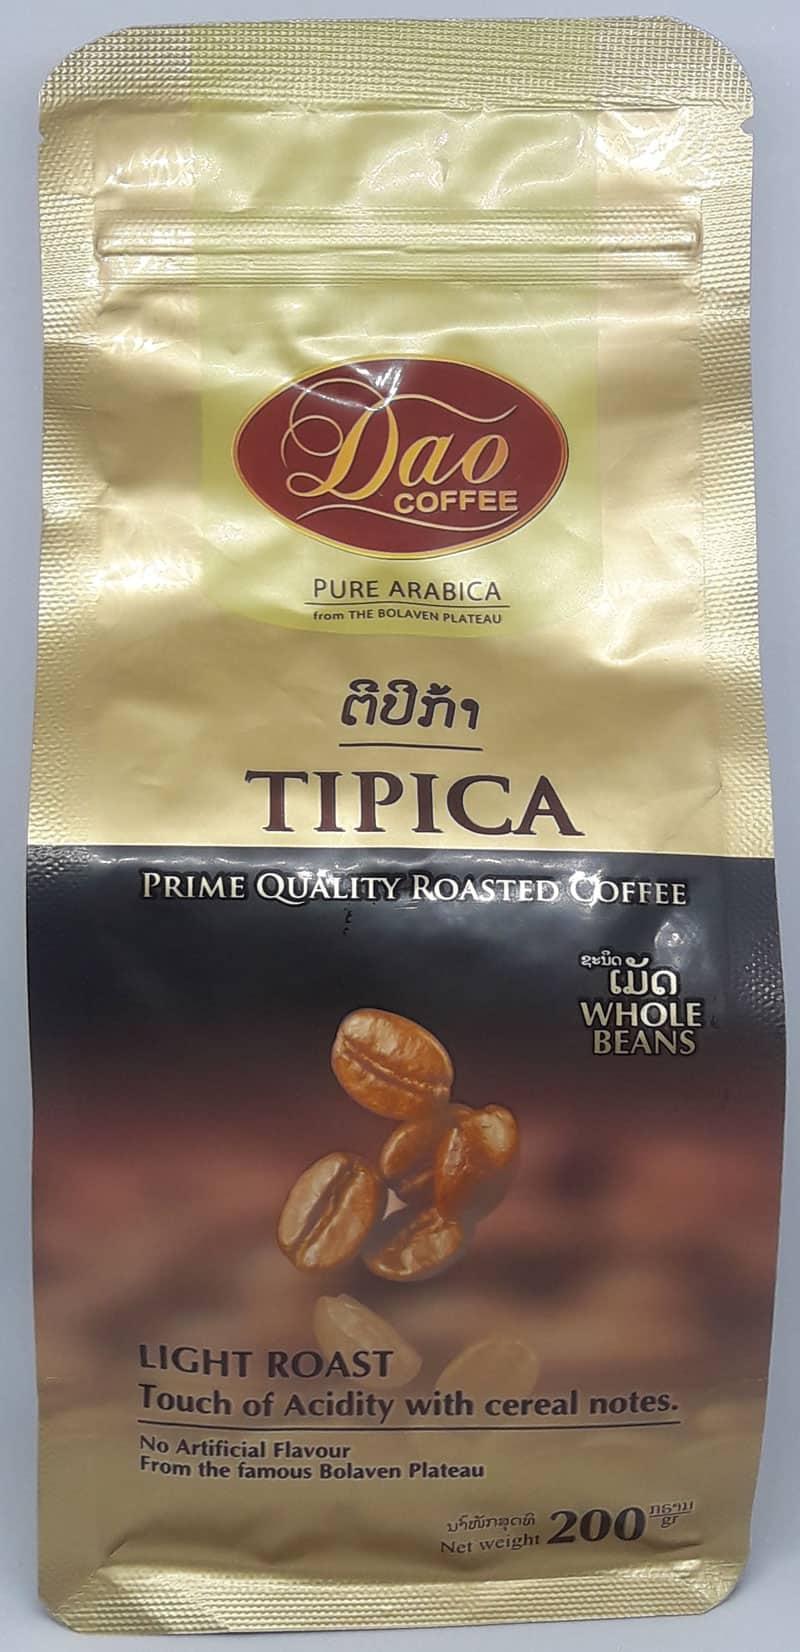 Tipica Pure Arabica Light Roast